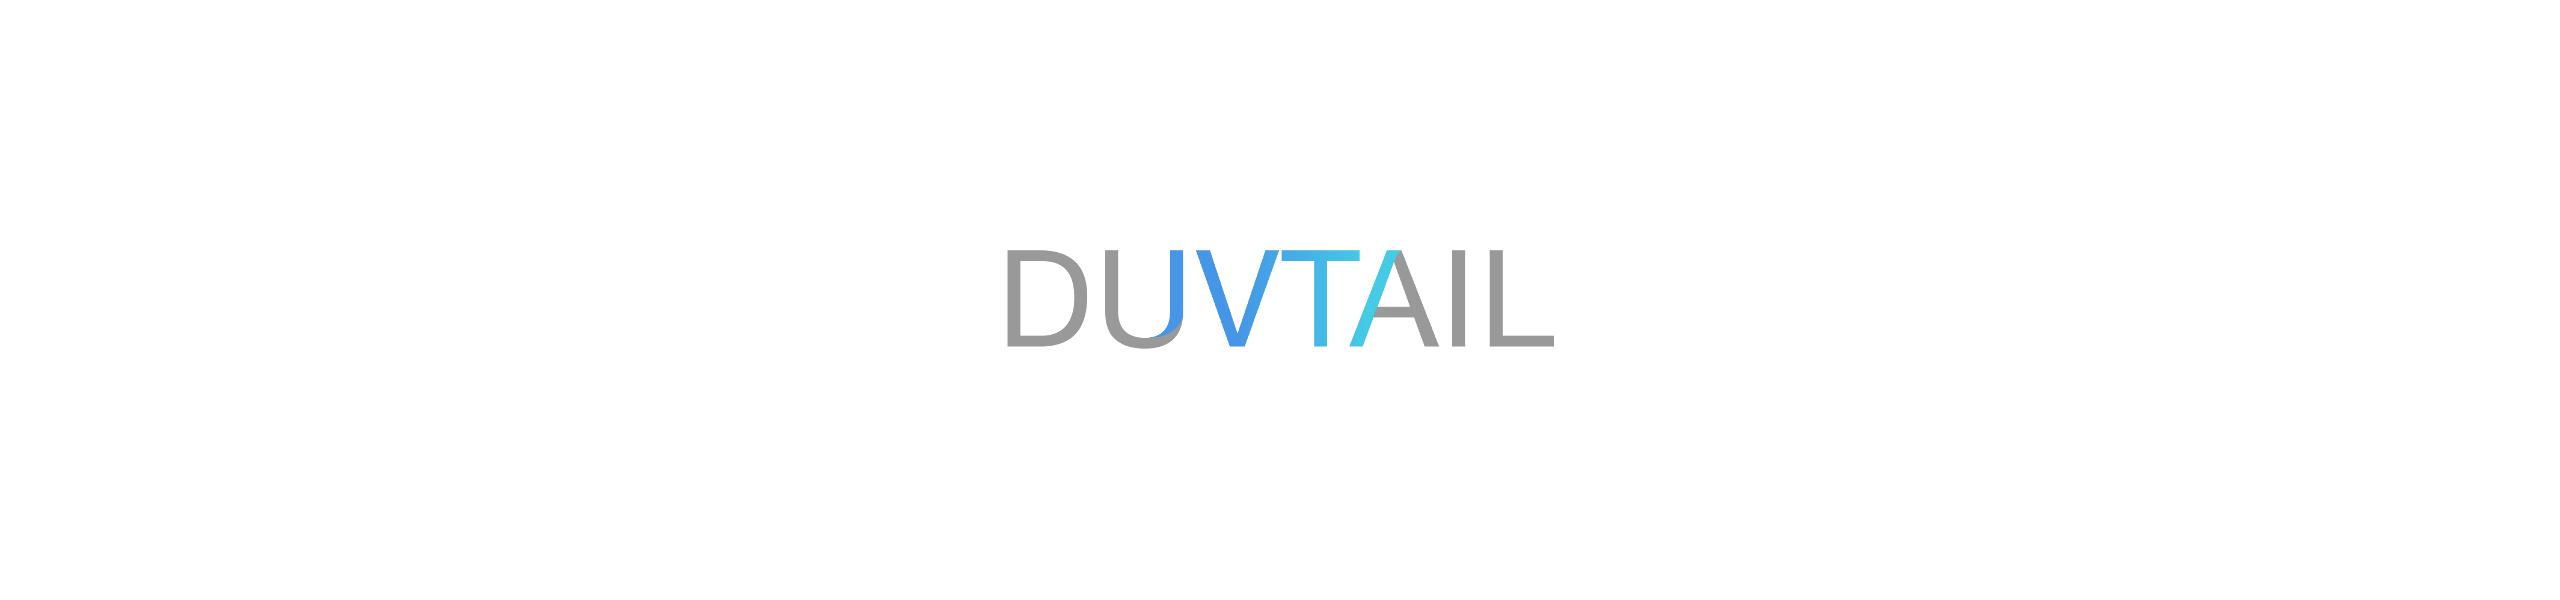 Duvtail